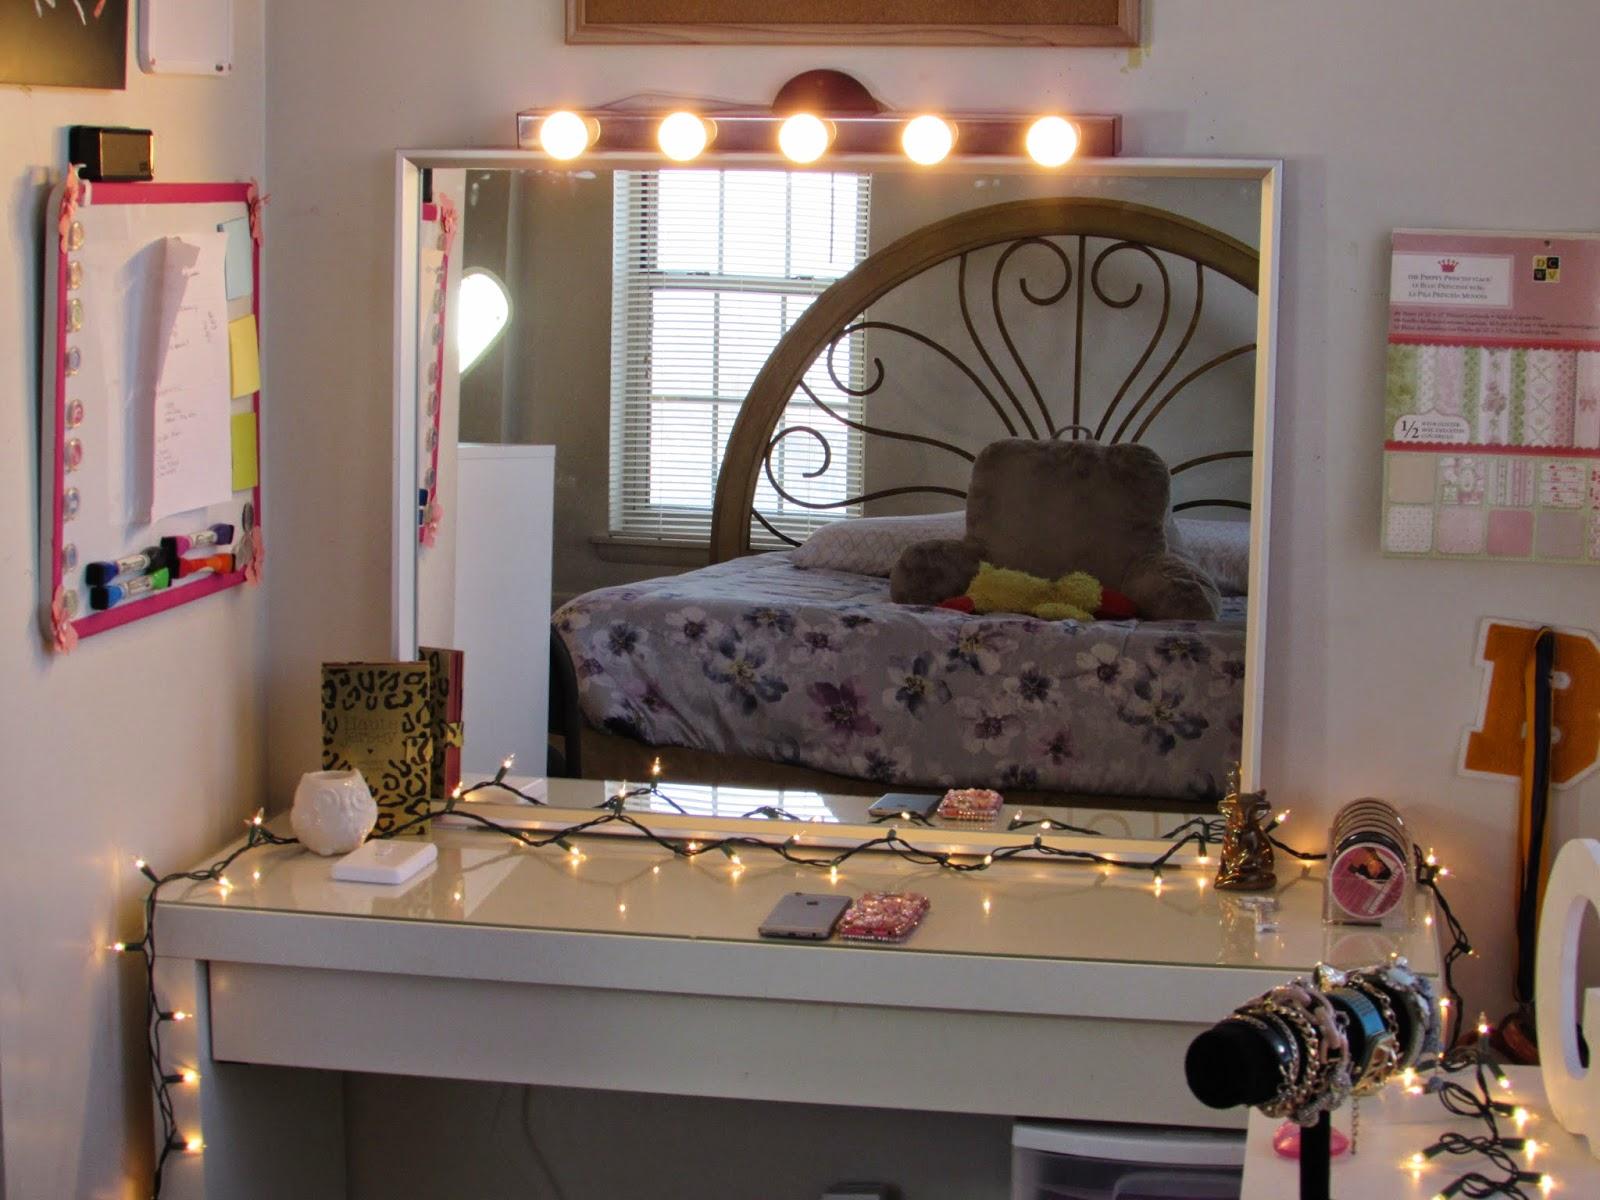 Beauty By Genecia: DIY Hollywood Vanity Light Mirror DIY Room Decor Easy, Cheap, & NO DRILLING!